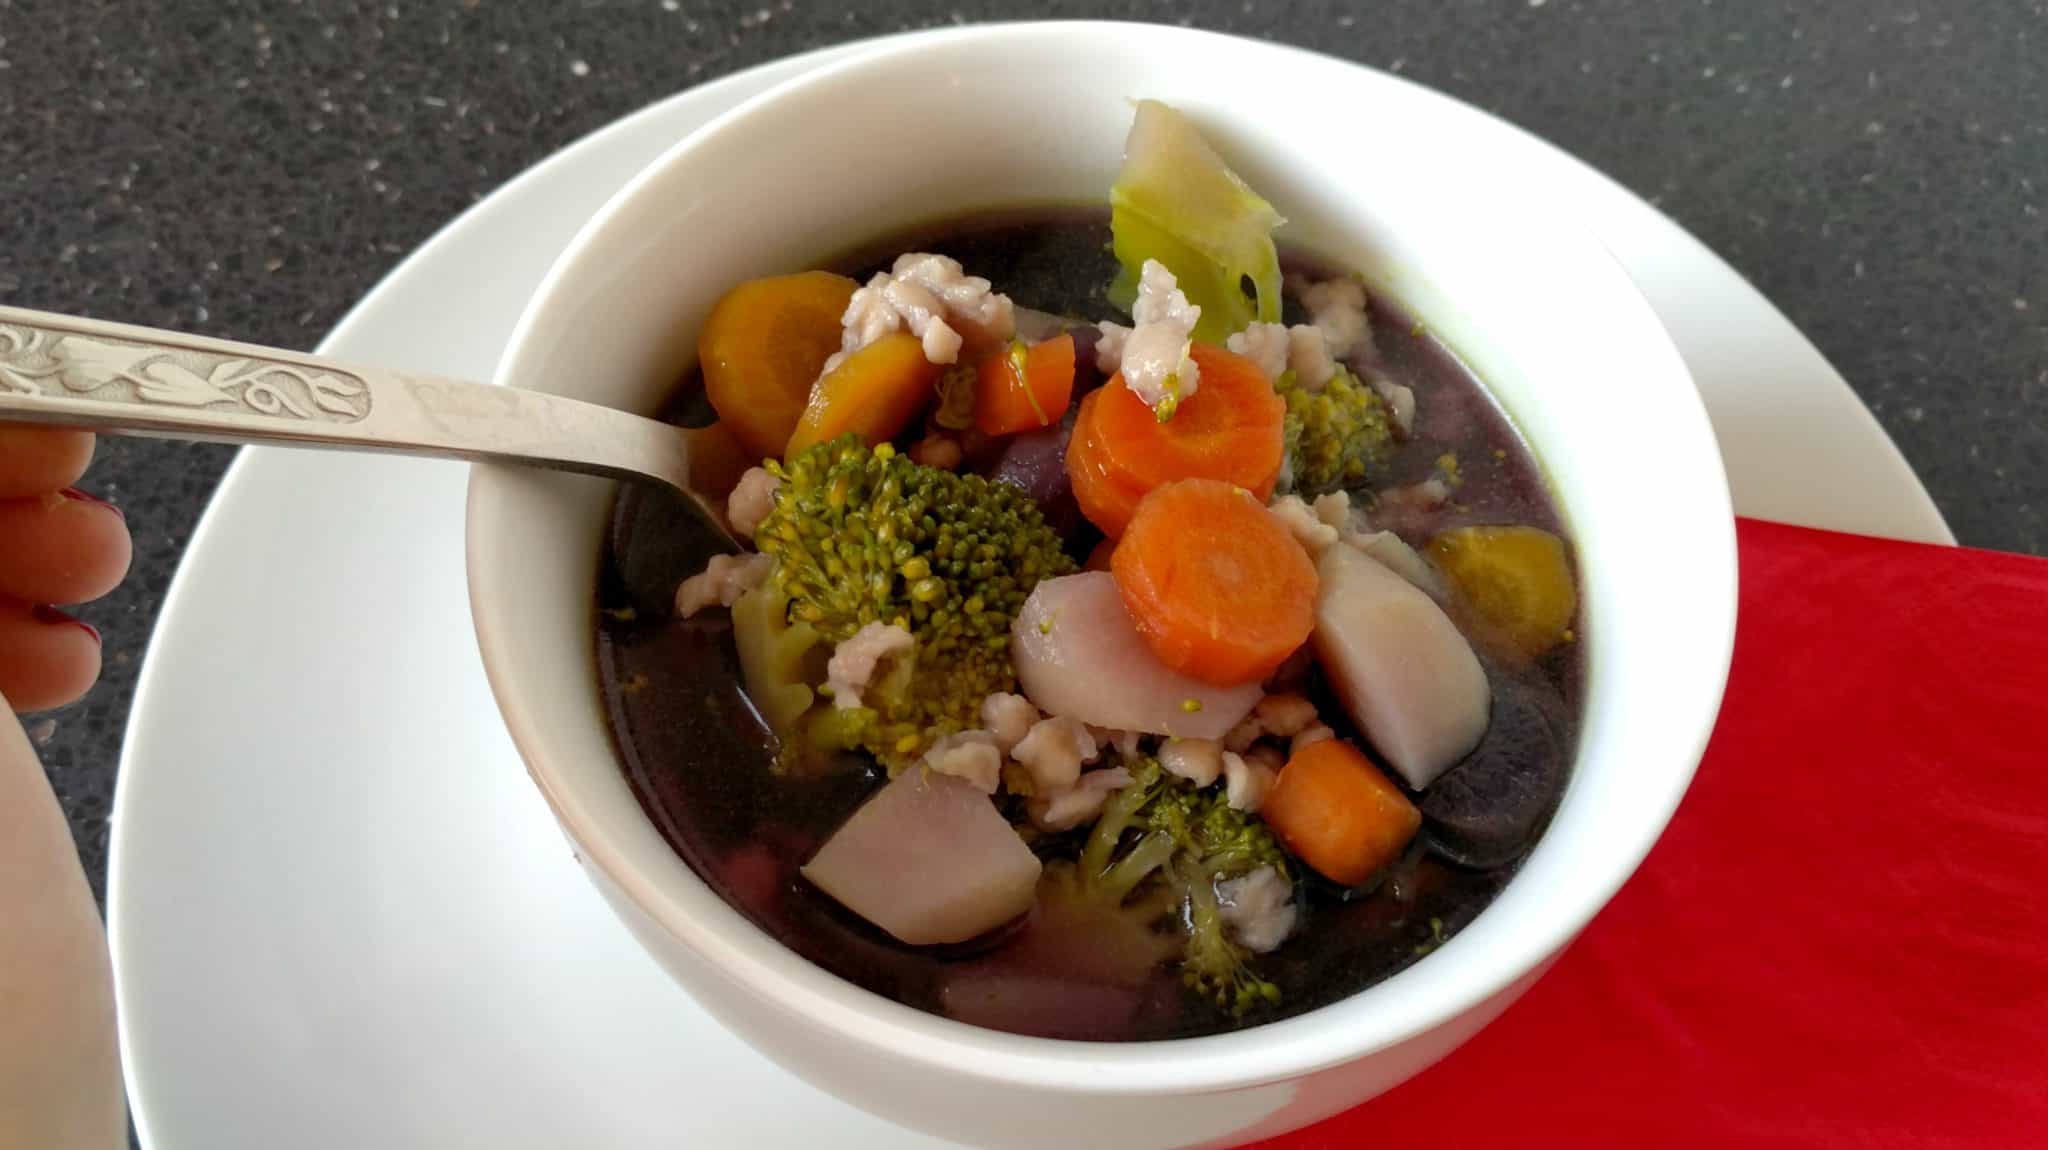 Farebná protizápalová polievka